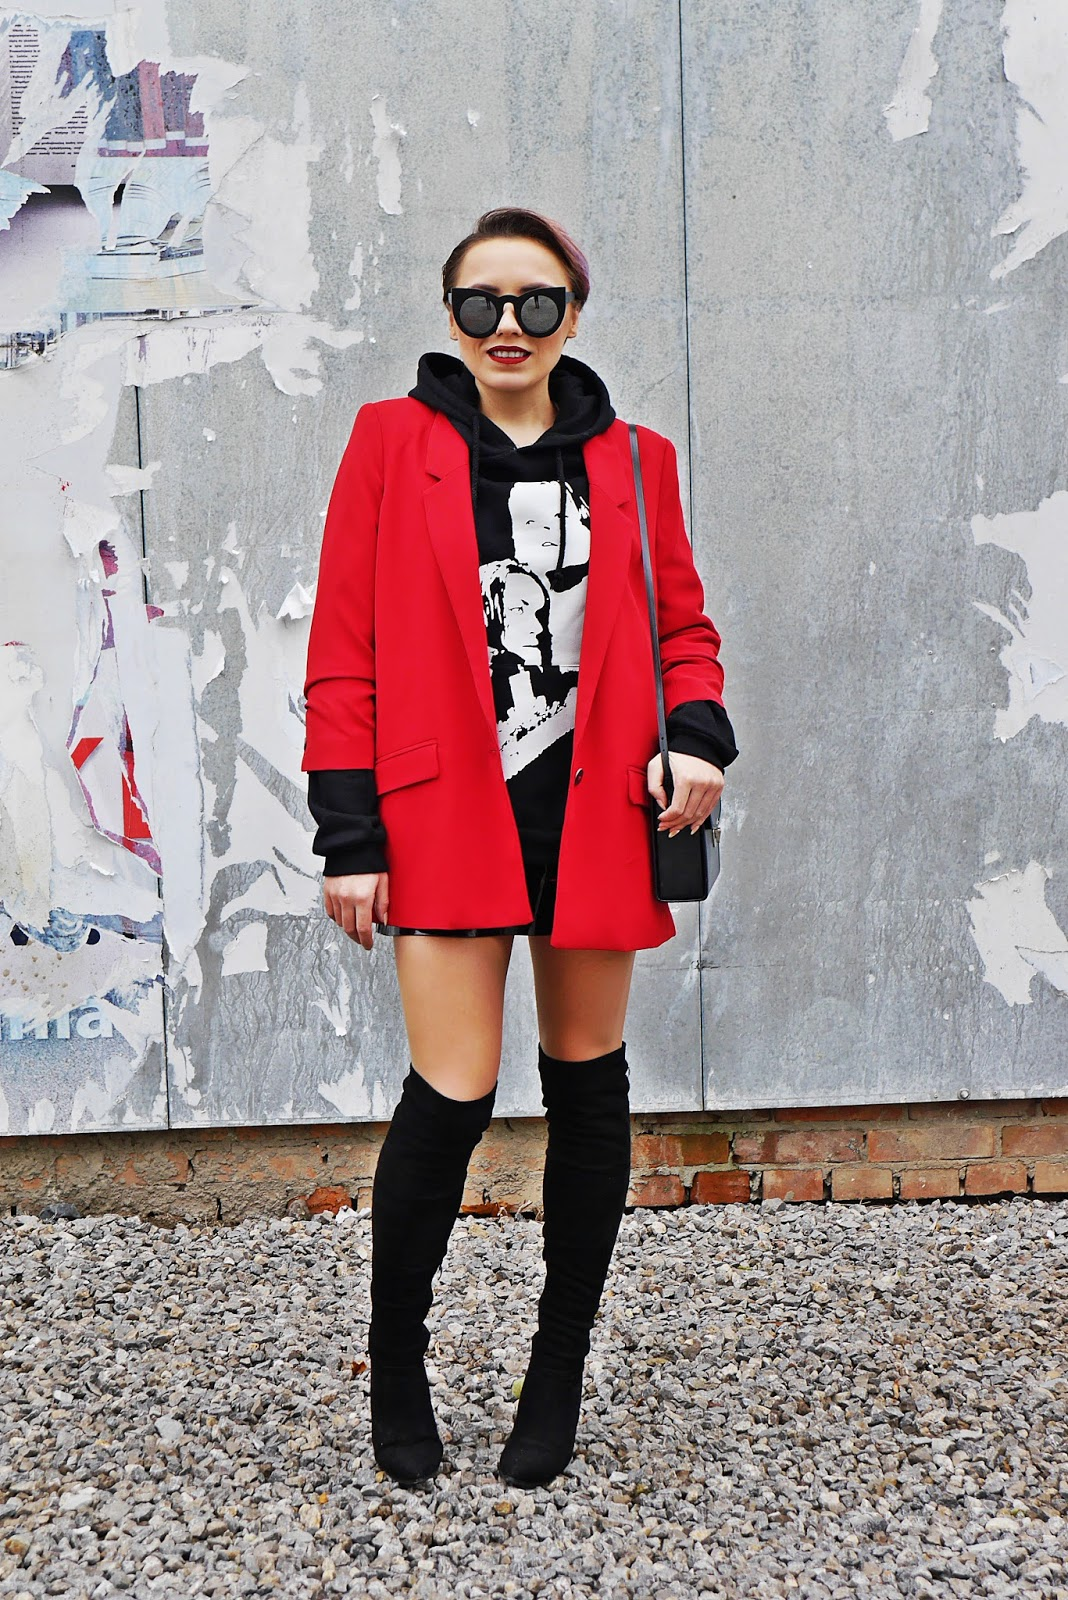 7_blog_modowy_pulawy_blogerka_modowa_karyn_171017